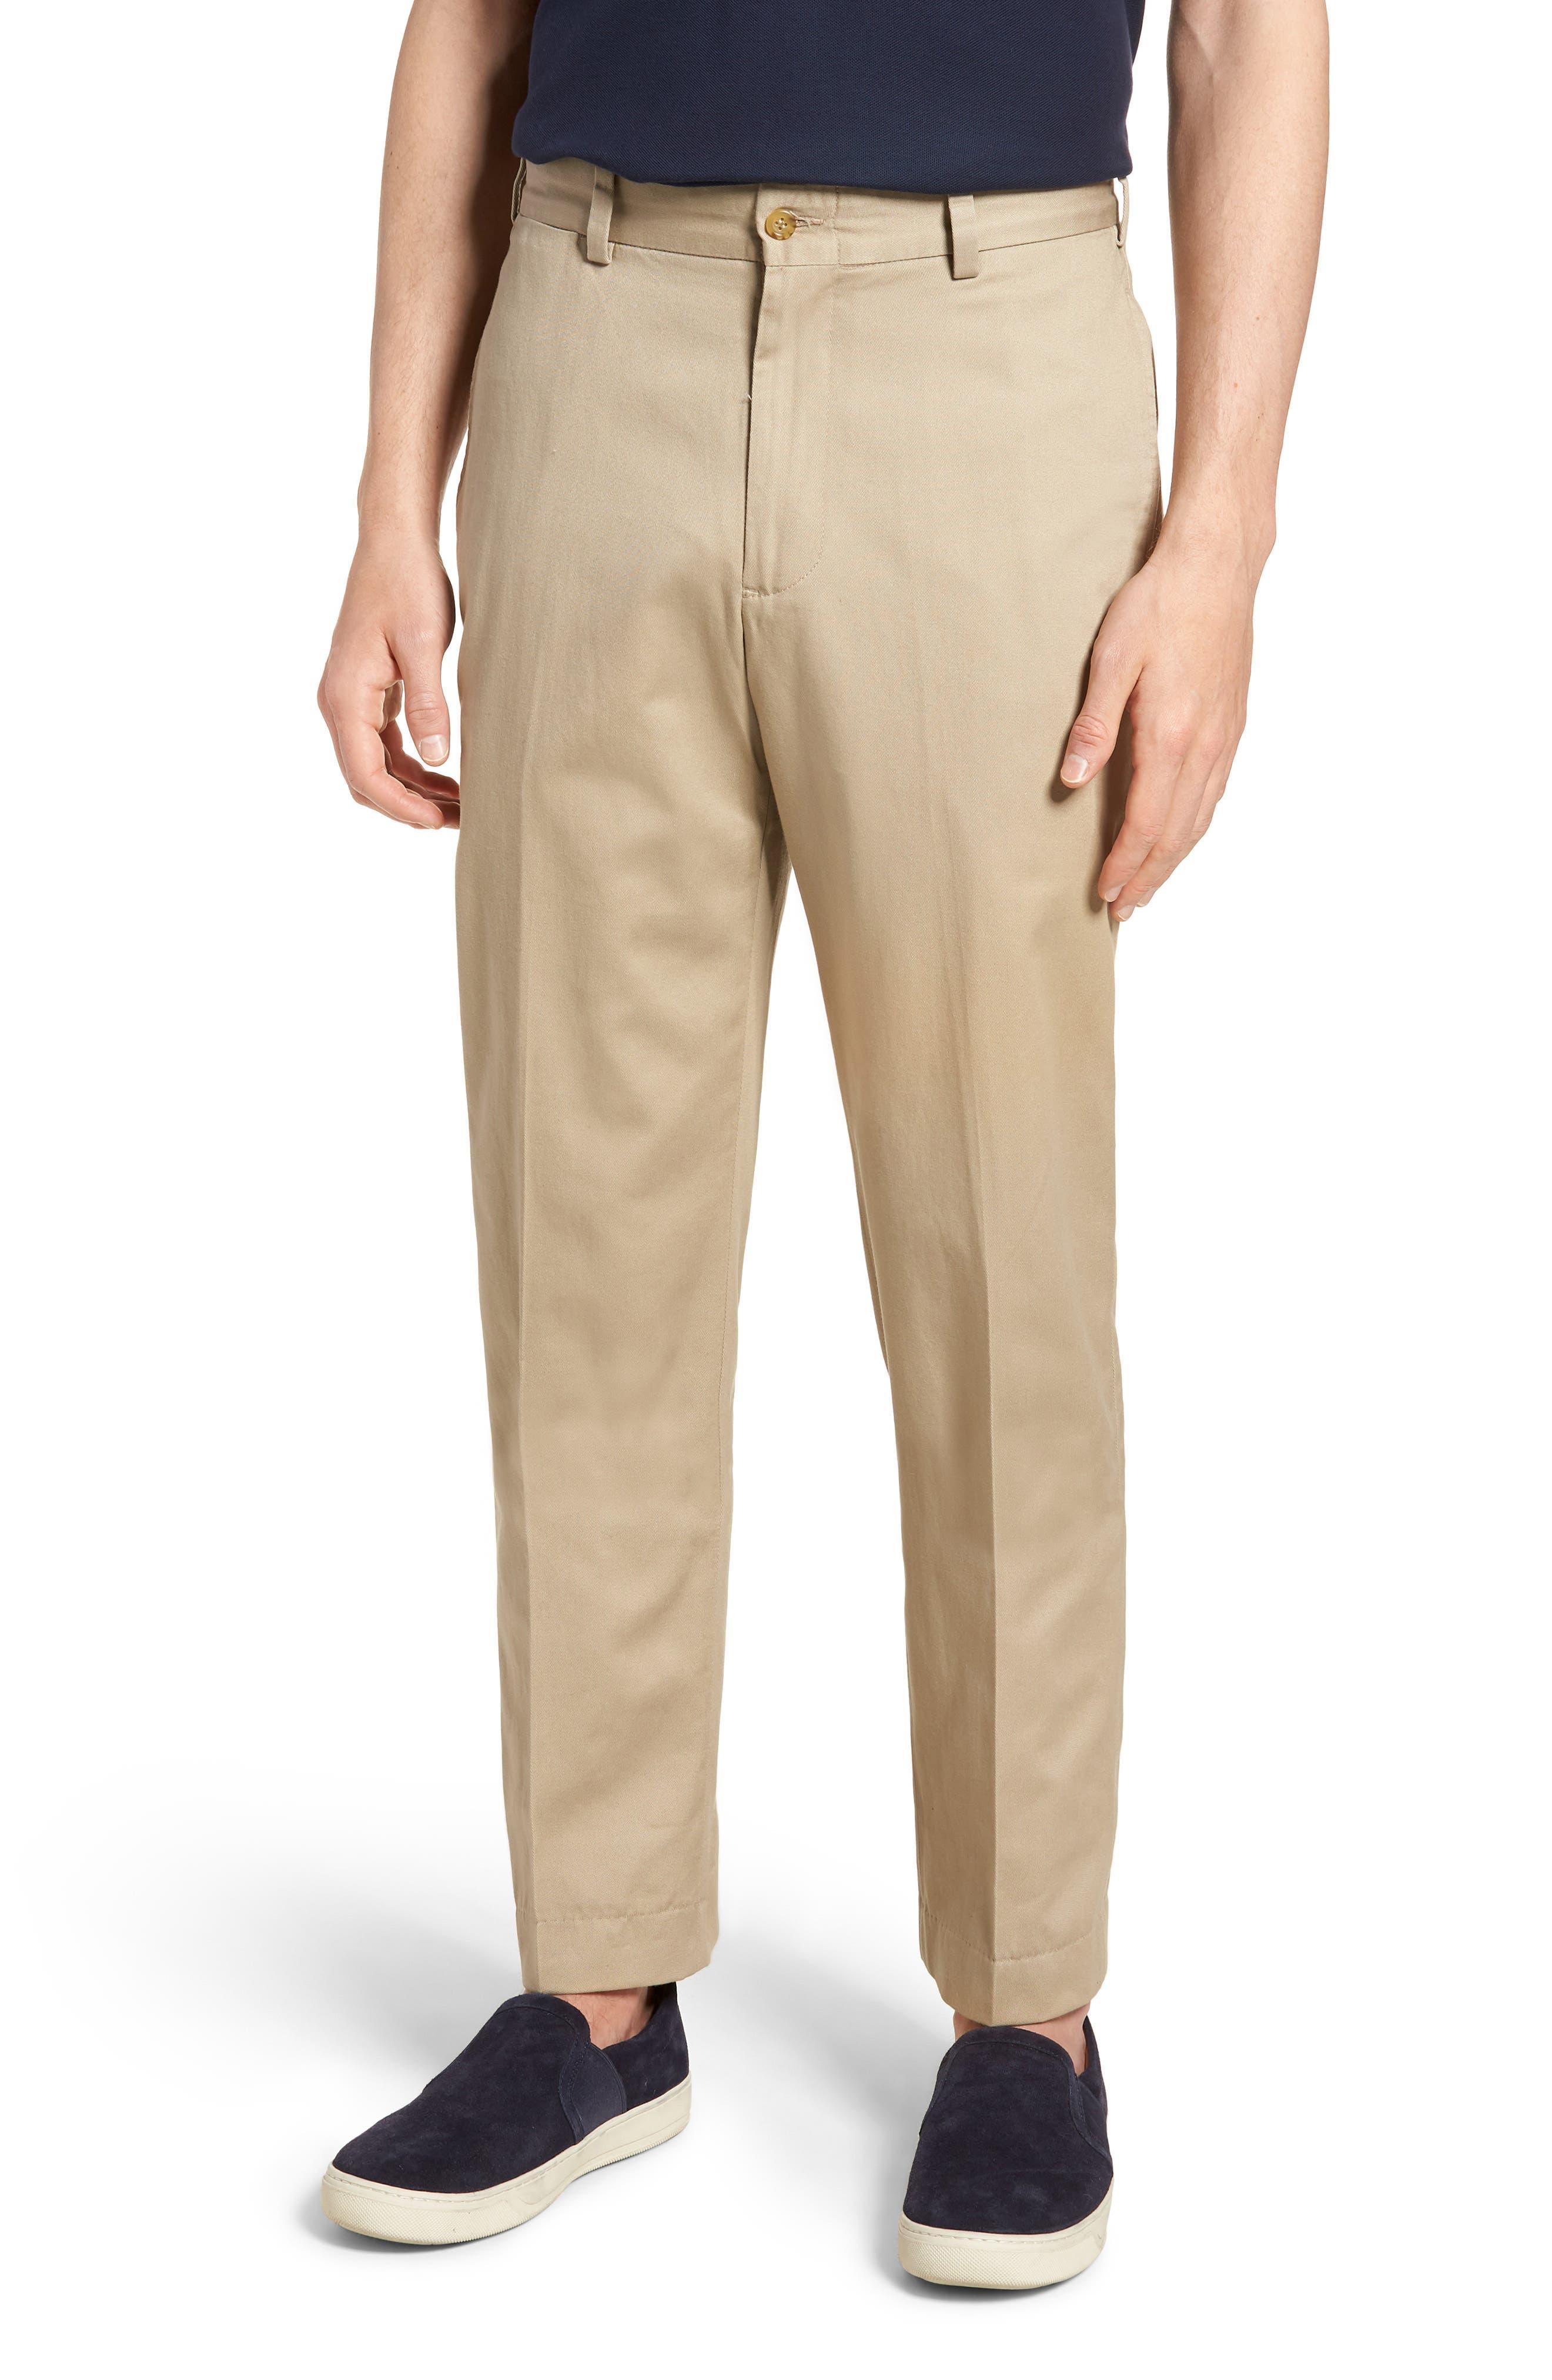 M2 Classic Fit Vintage Twill Flat Front Pants,                             Main thumbnail 1, color,                             Khaki